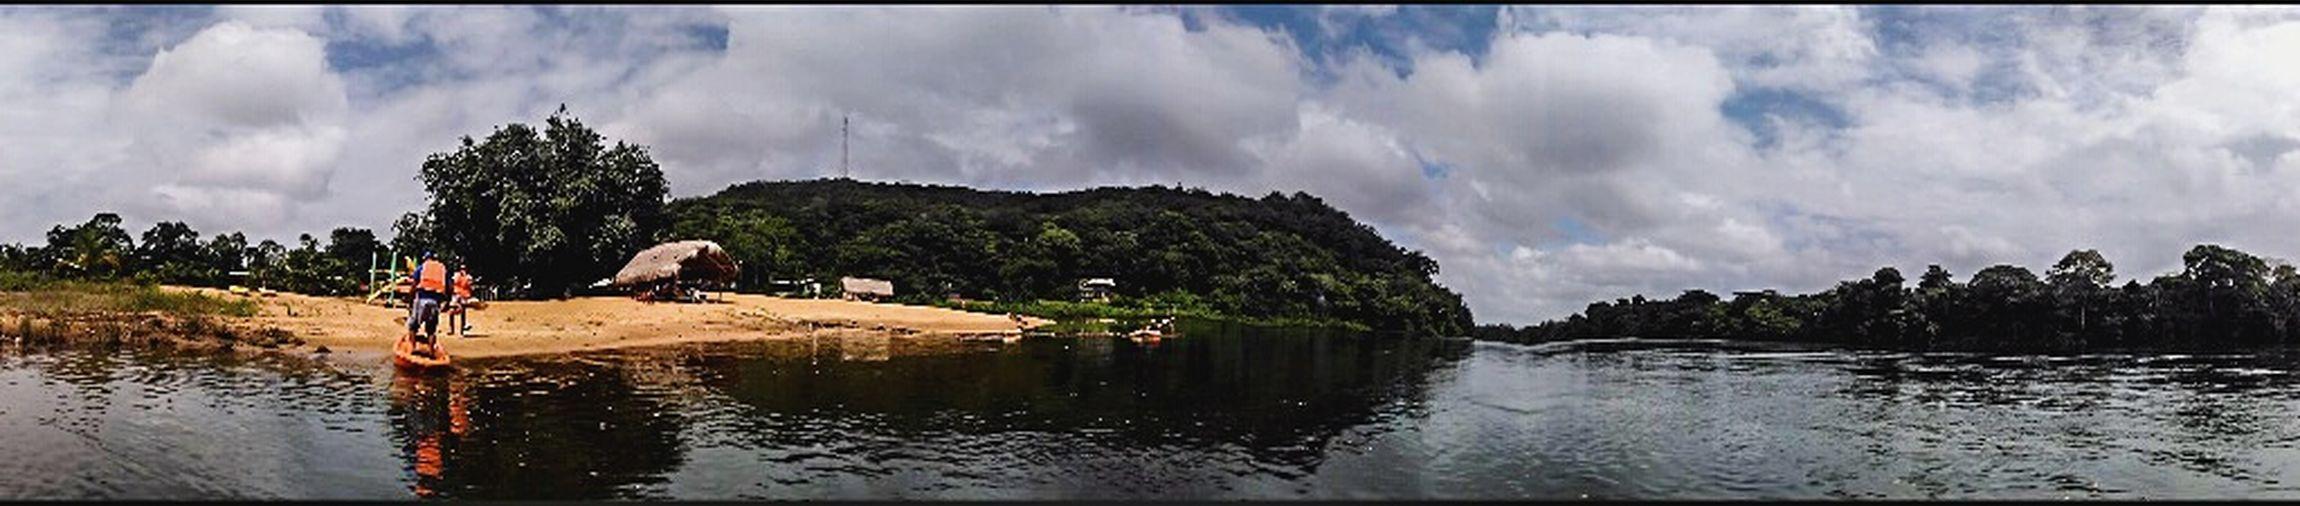 Panoramic Surinameriver Bergendal Brokopondo District Suriname South America